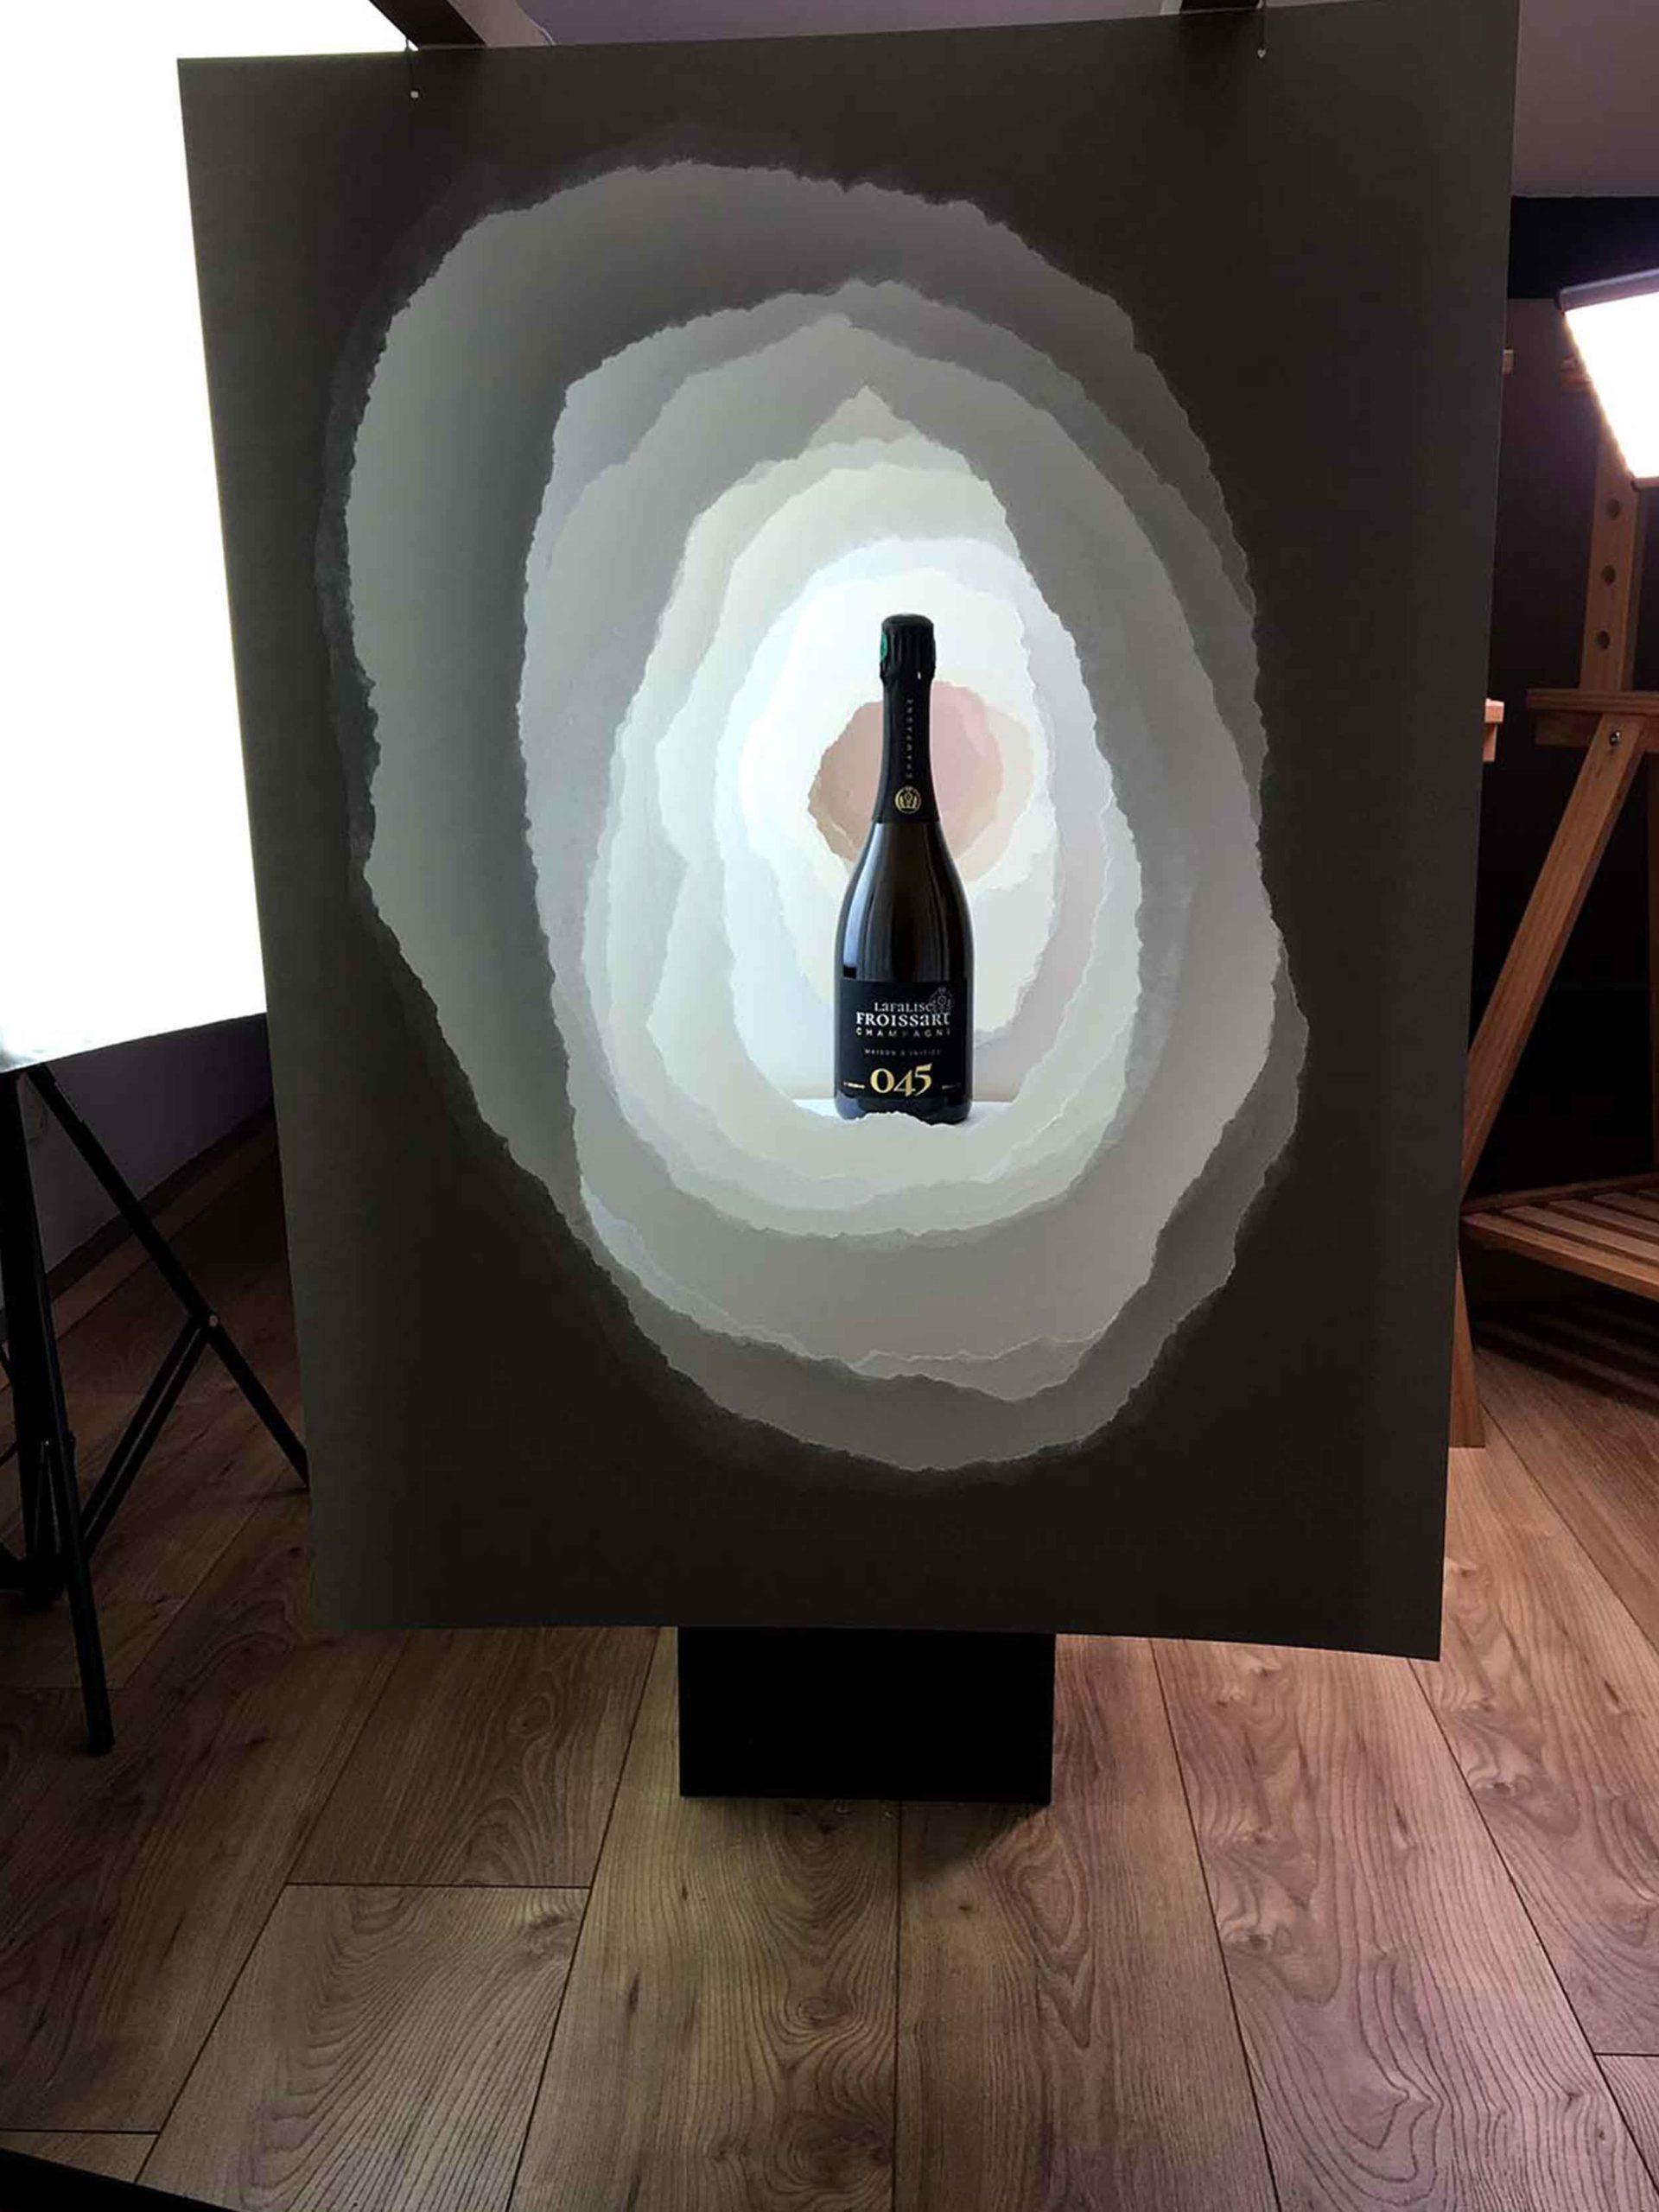 Packshots photo lifestyle 045 - Champagne Lafalise Froissart - Agence Discovery